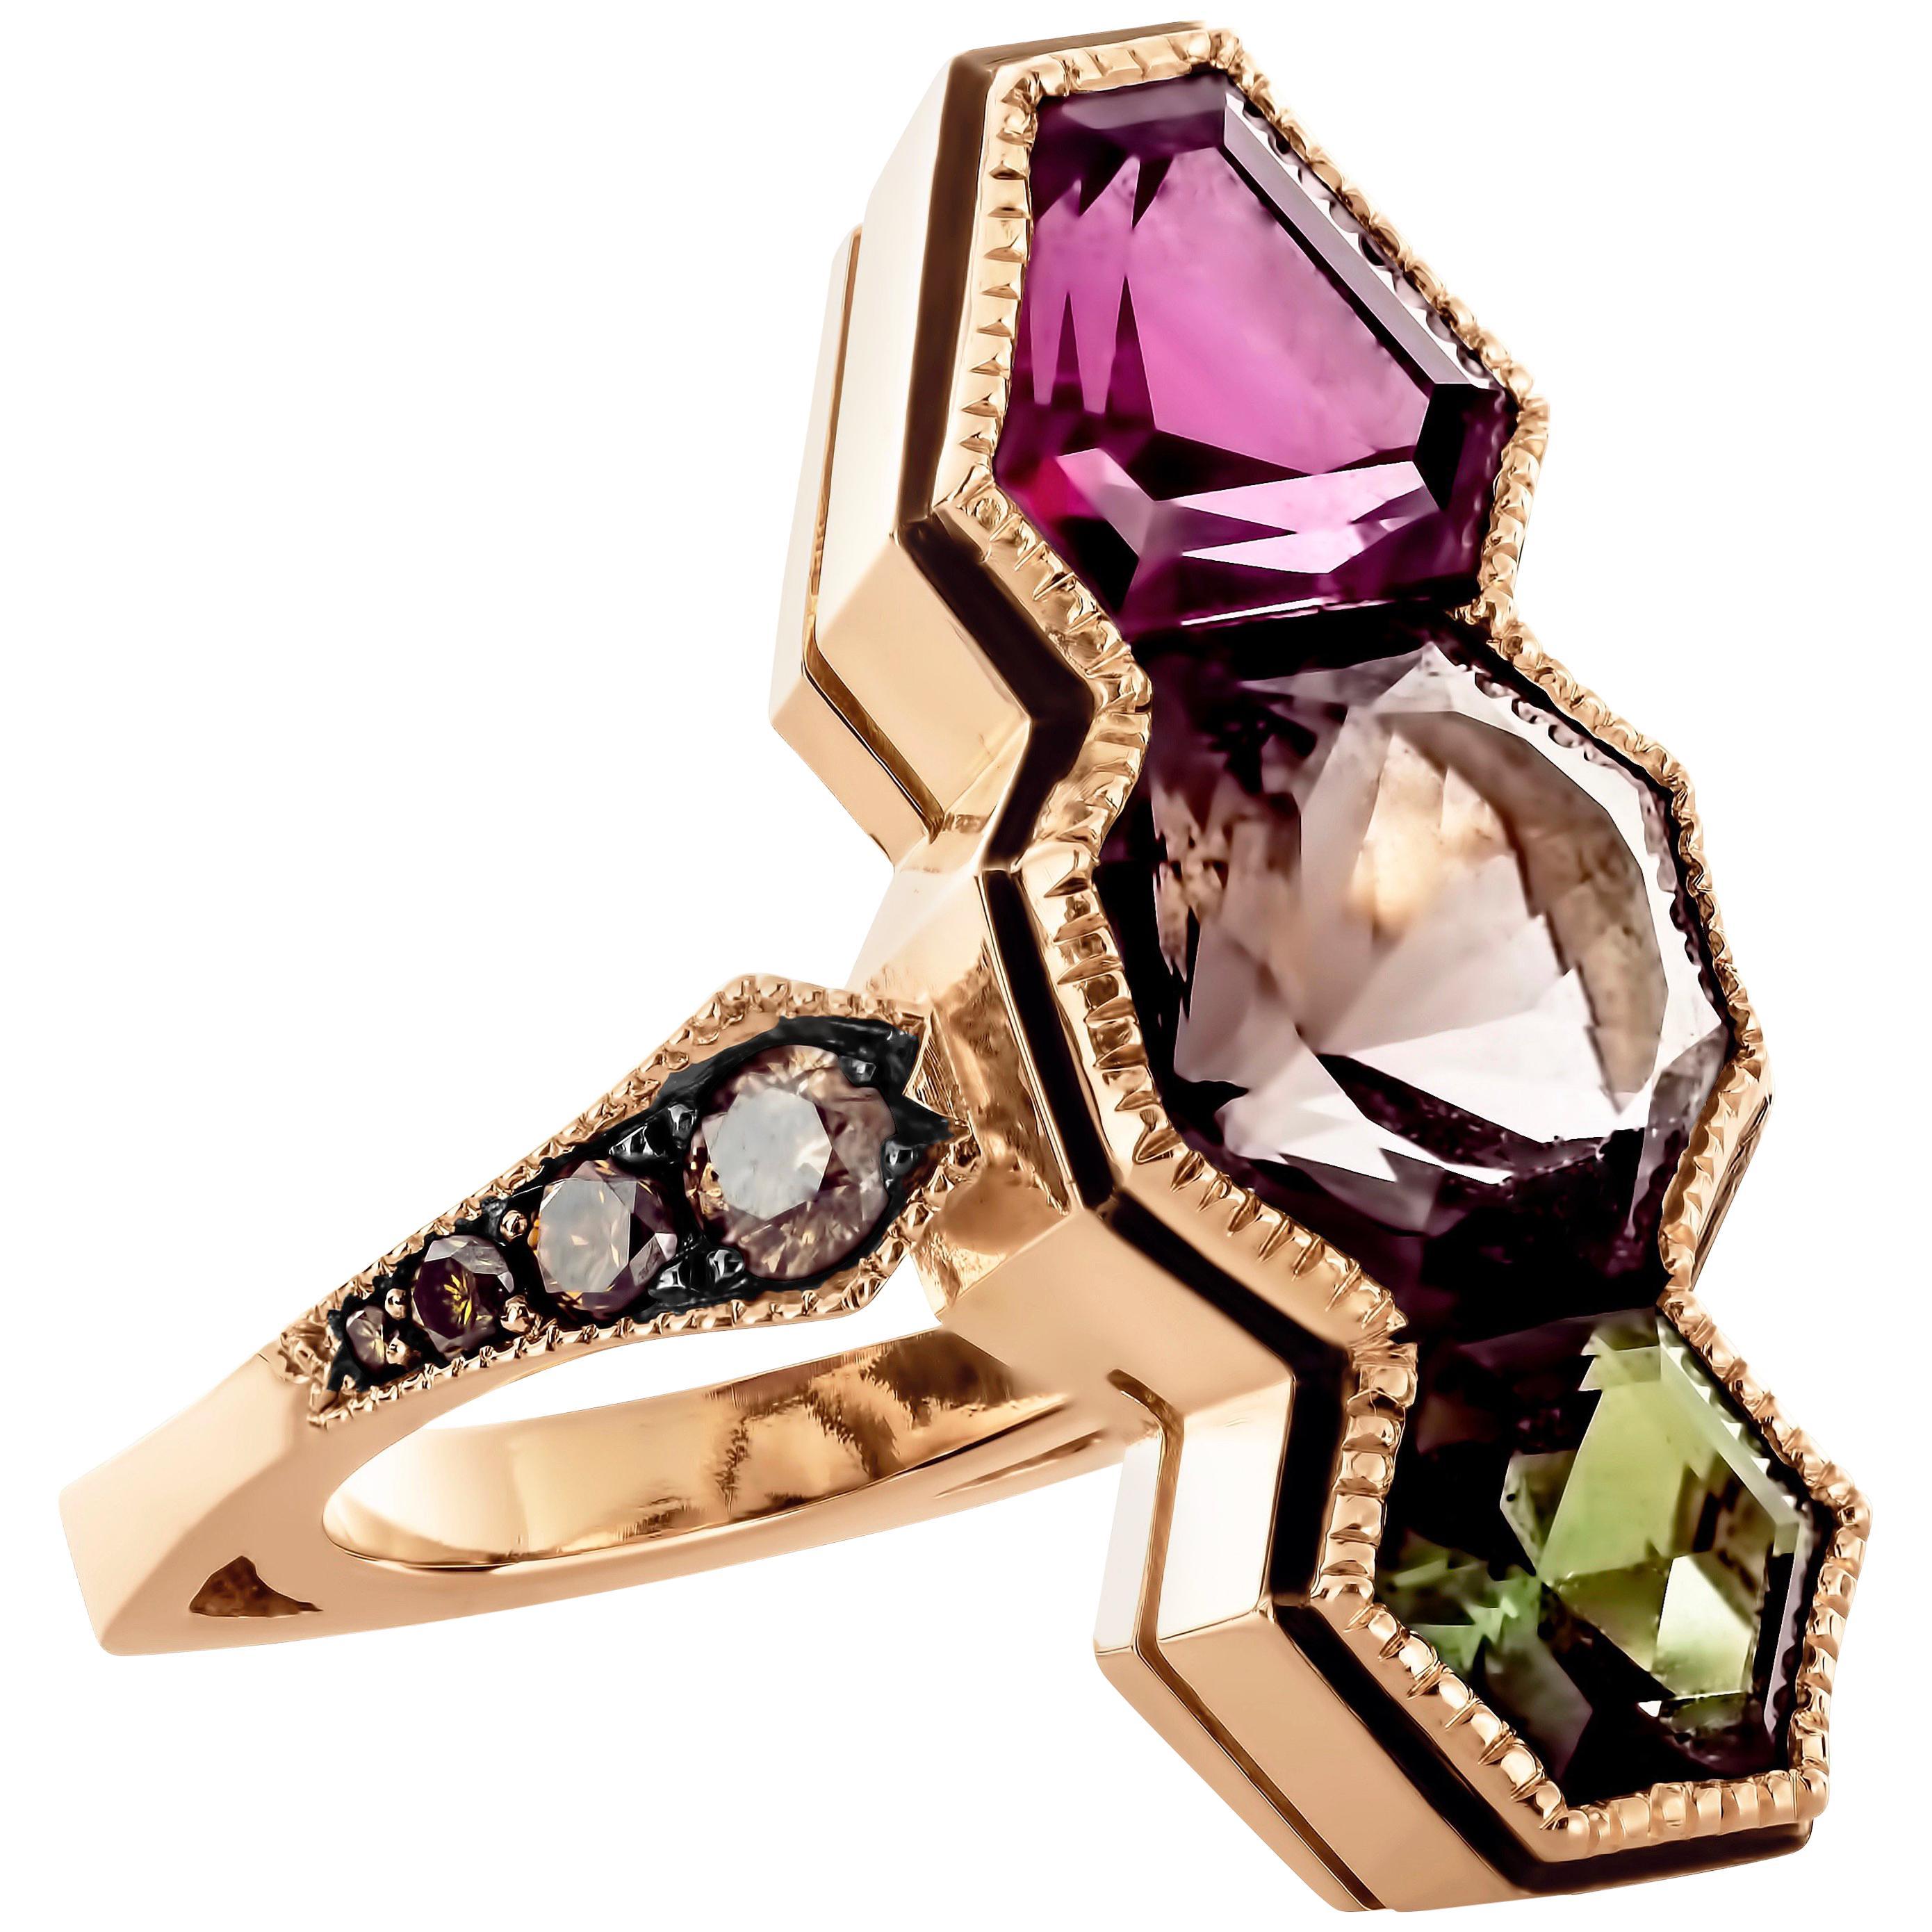 Joke Quick 18K Rose Gold Hexagon Cut Millegrain Ring